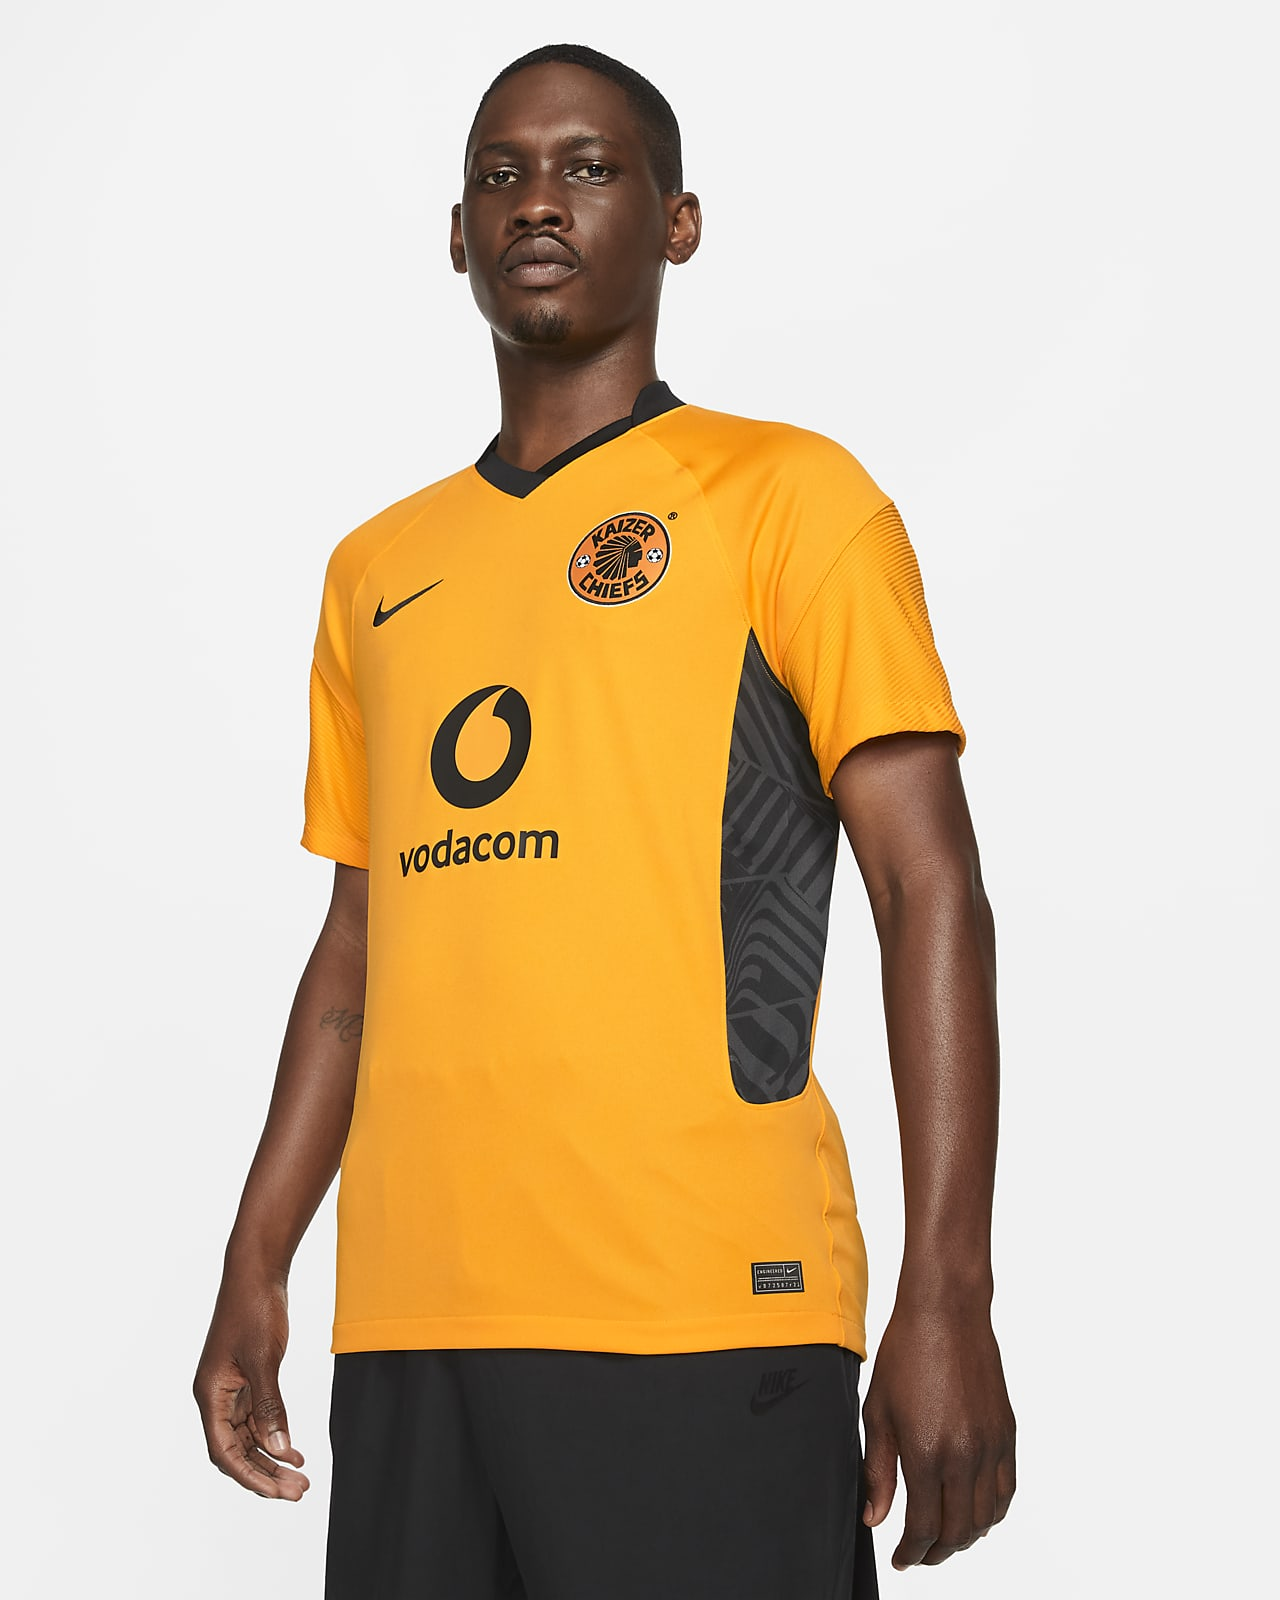 Kaizer Chiefs F.C. 2021/22 Stadium Home Men's Nike Dri-FIT Football Shirt